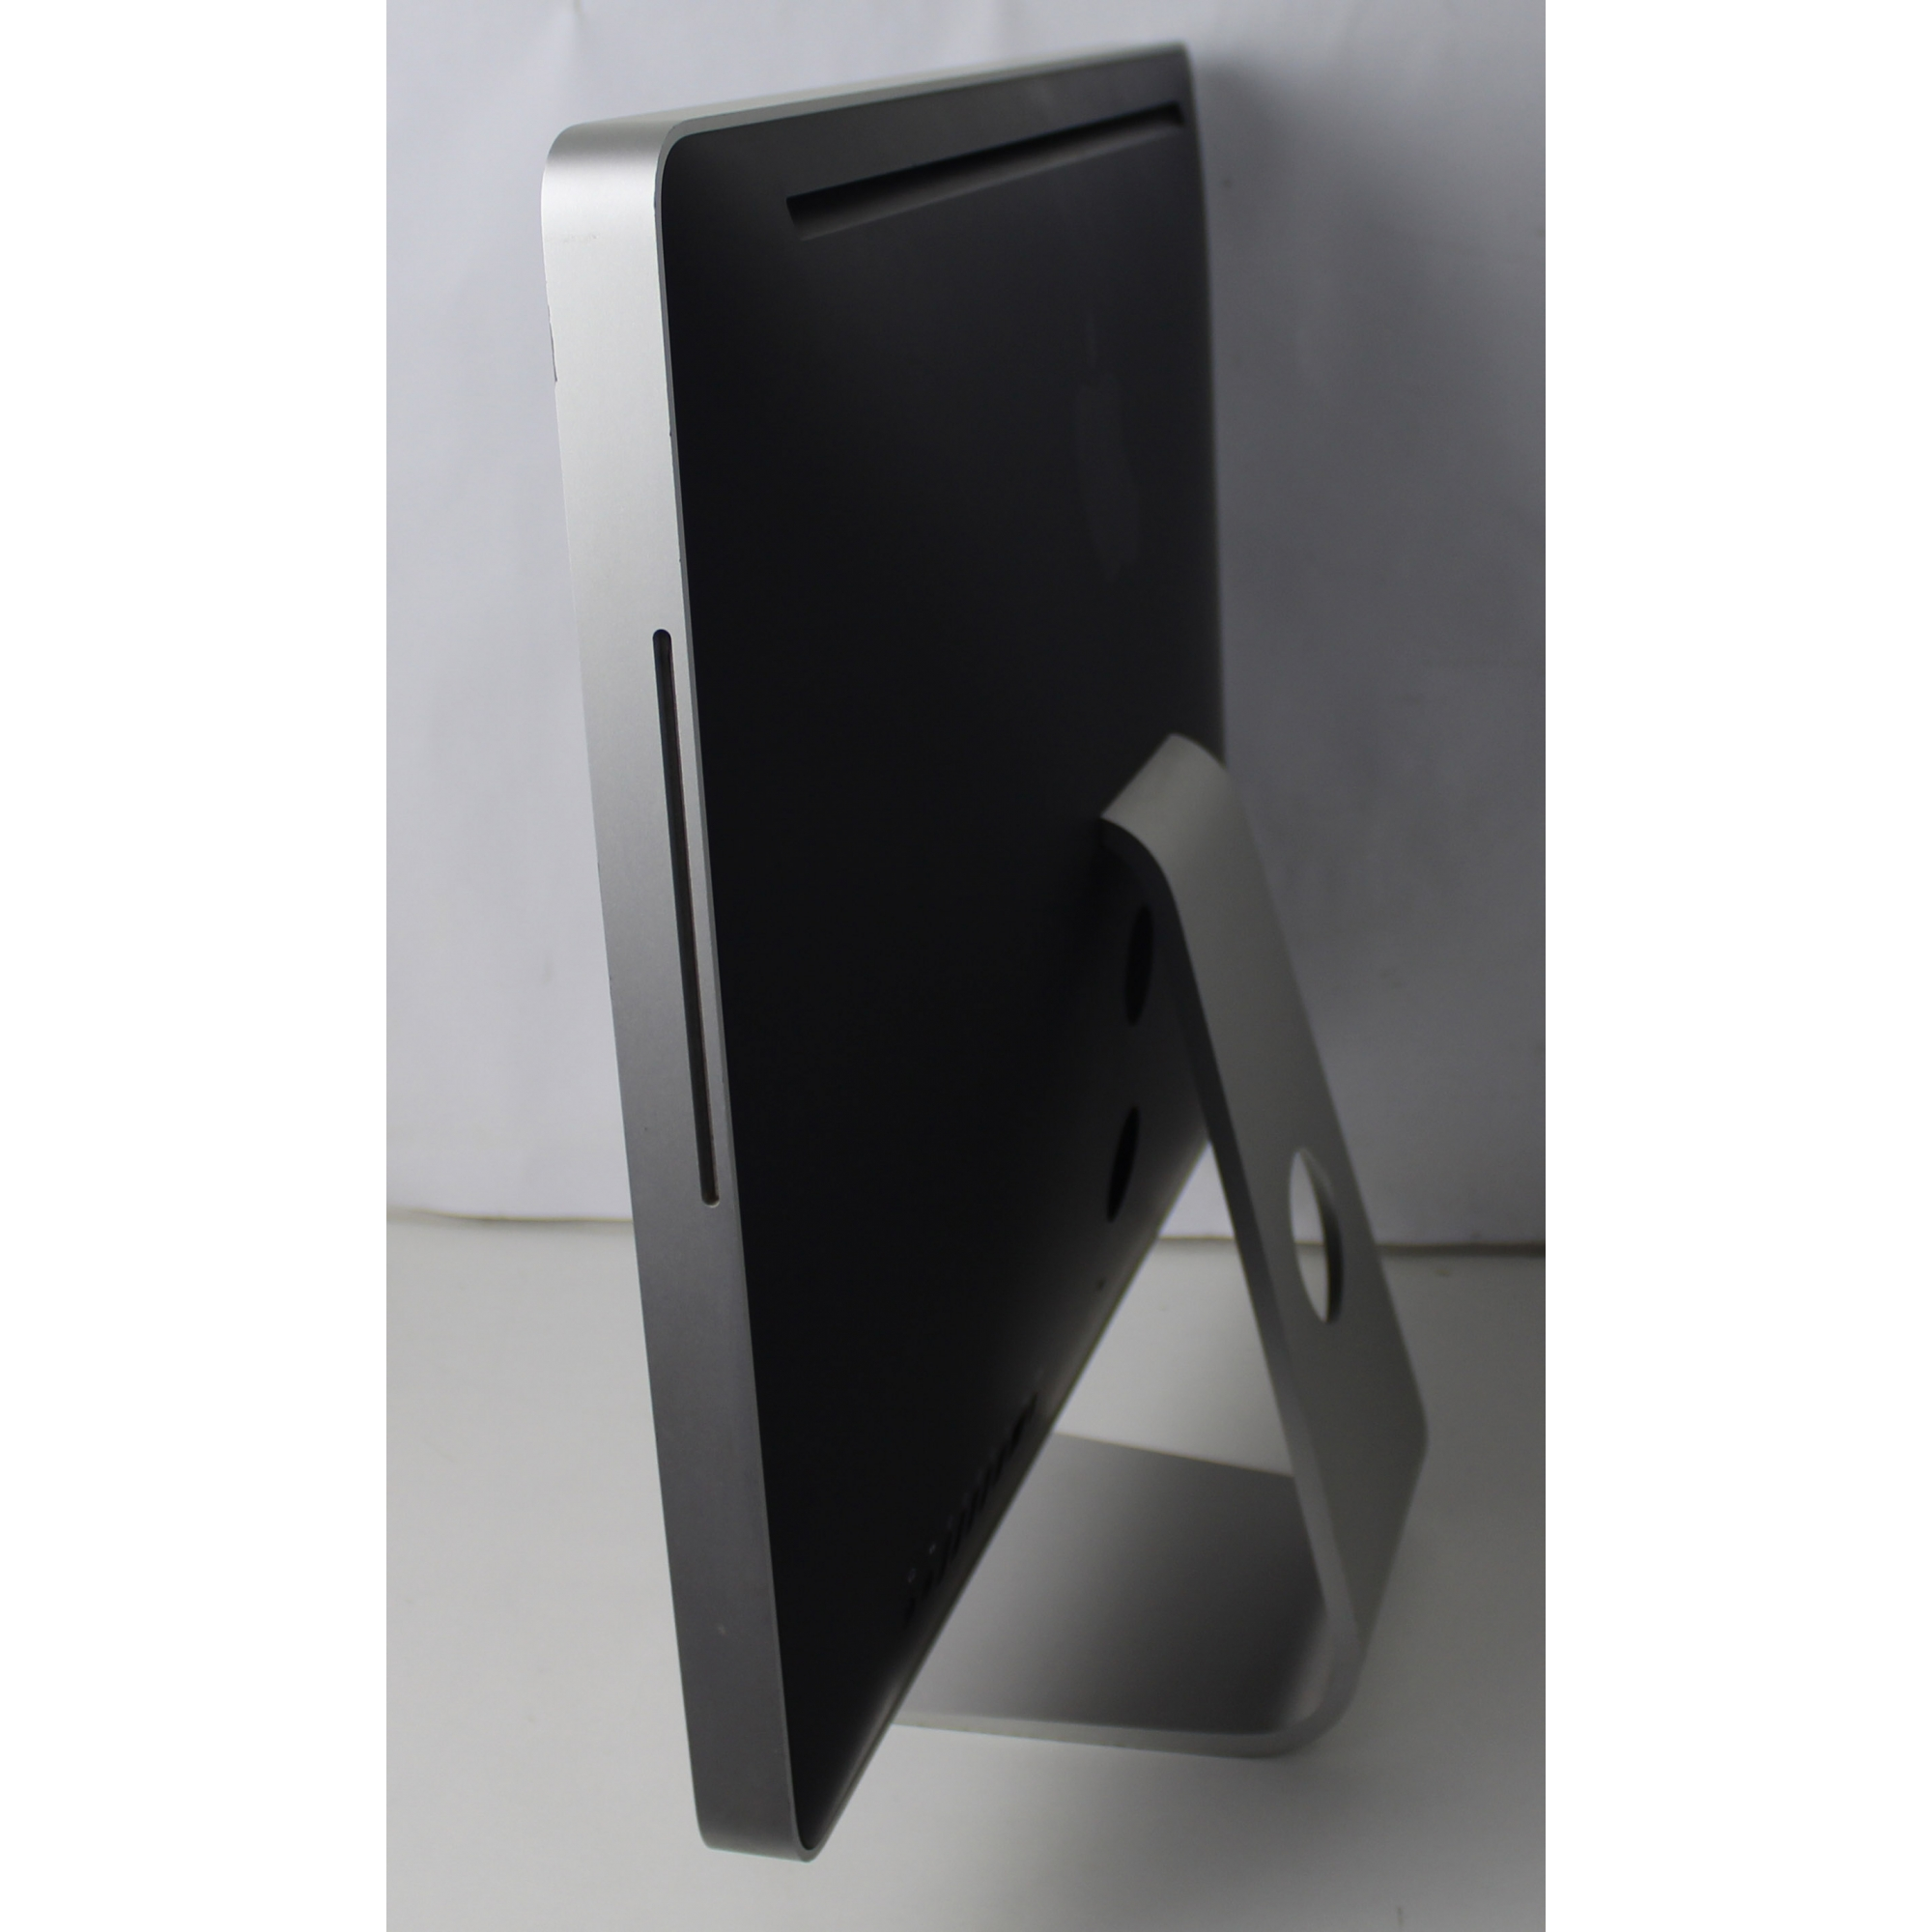 IMAC 20'' MC015LL/A INTEL CORE 2 DUO 2GHZ 4GB HD-160GB / NÃO ENVIAMOS